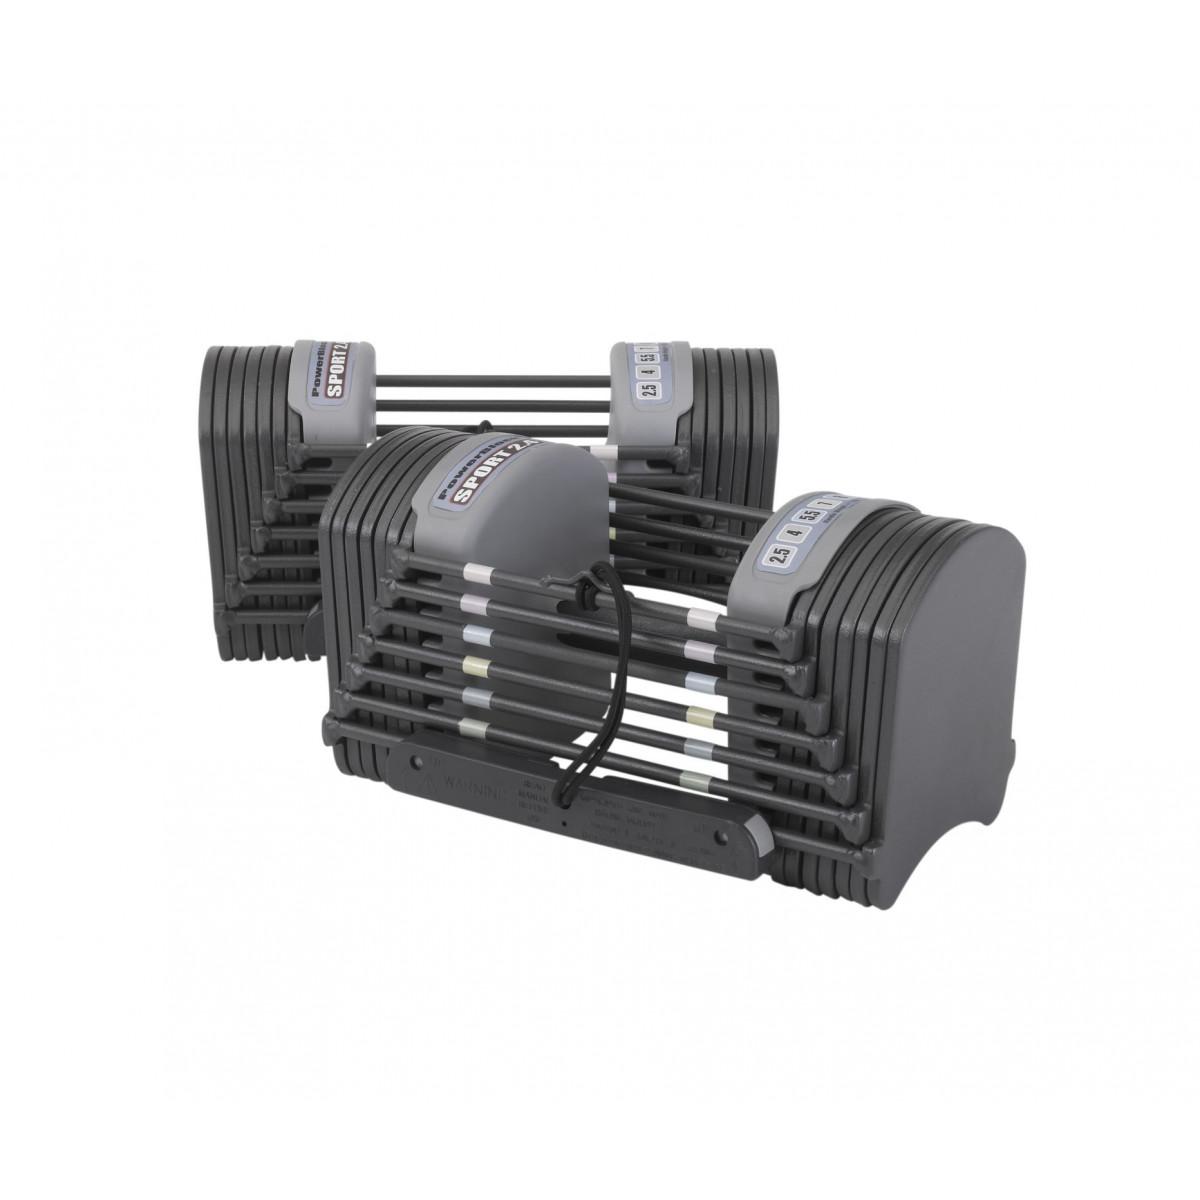 PowerBlock Sport 2.4 Adjustable Dumbbells - 1-11kgs